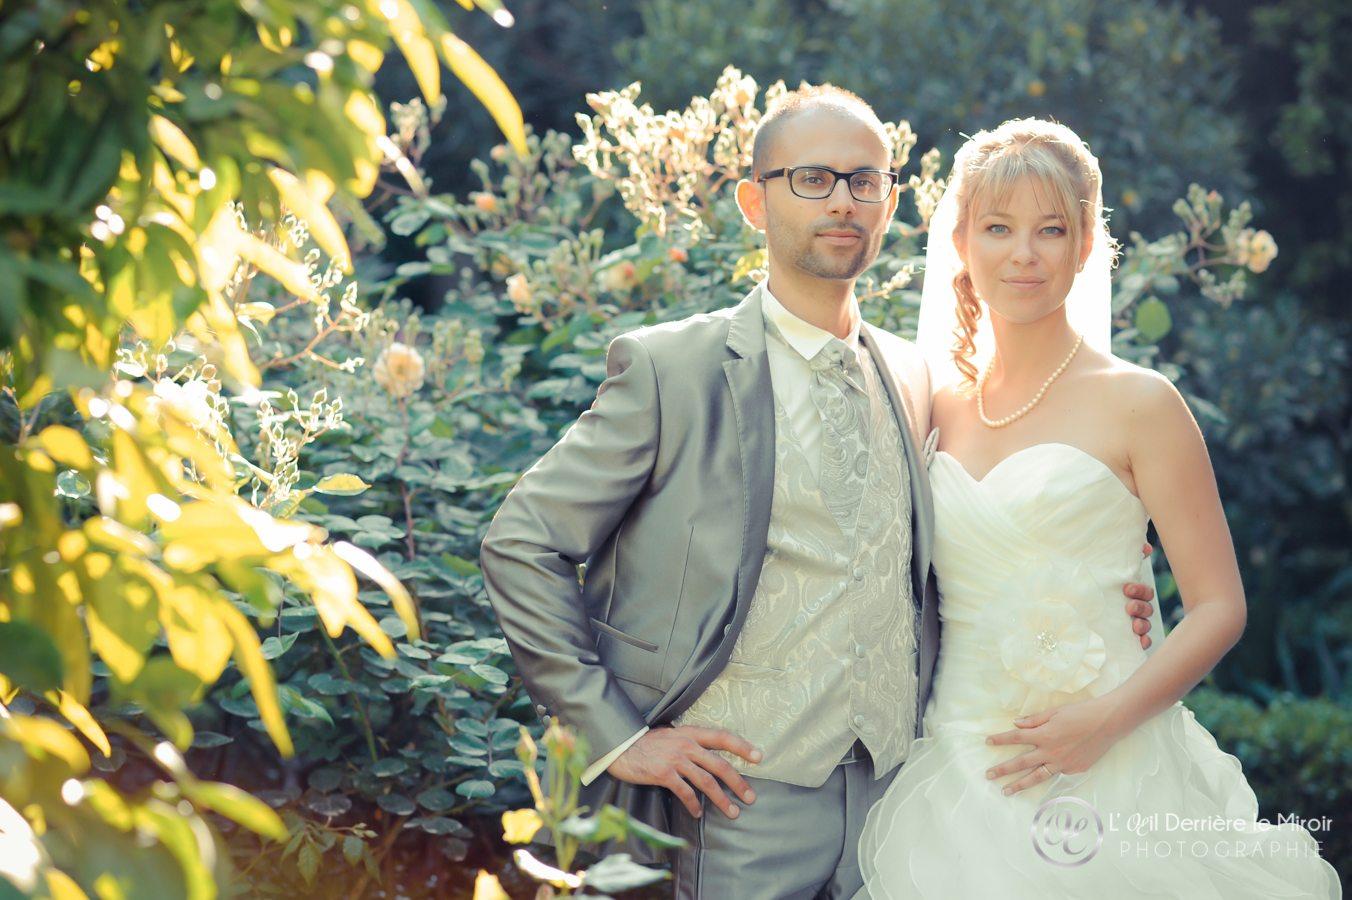 Photographe de mariage à Antibes